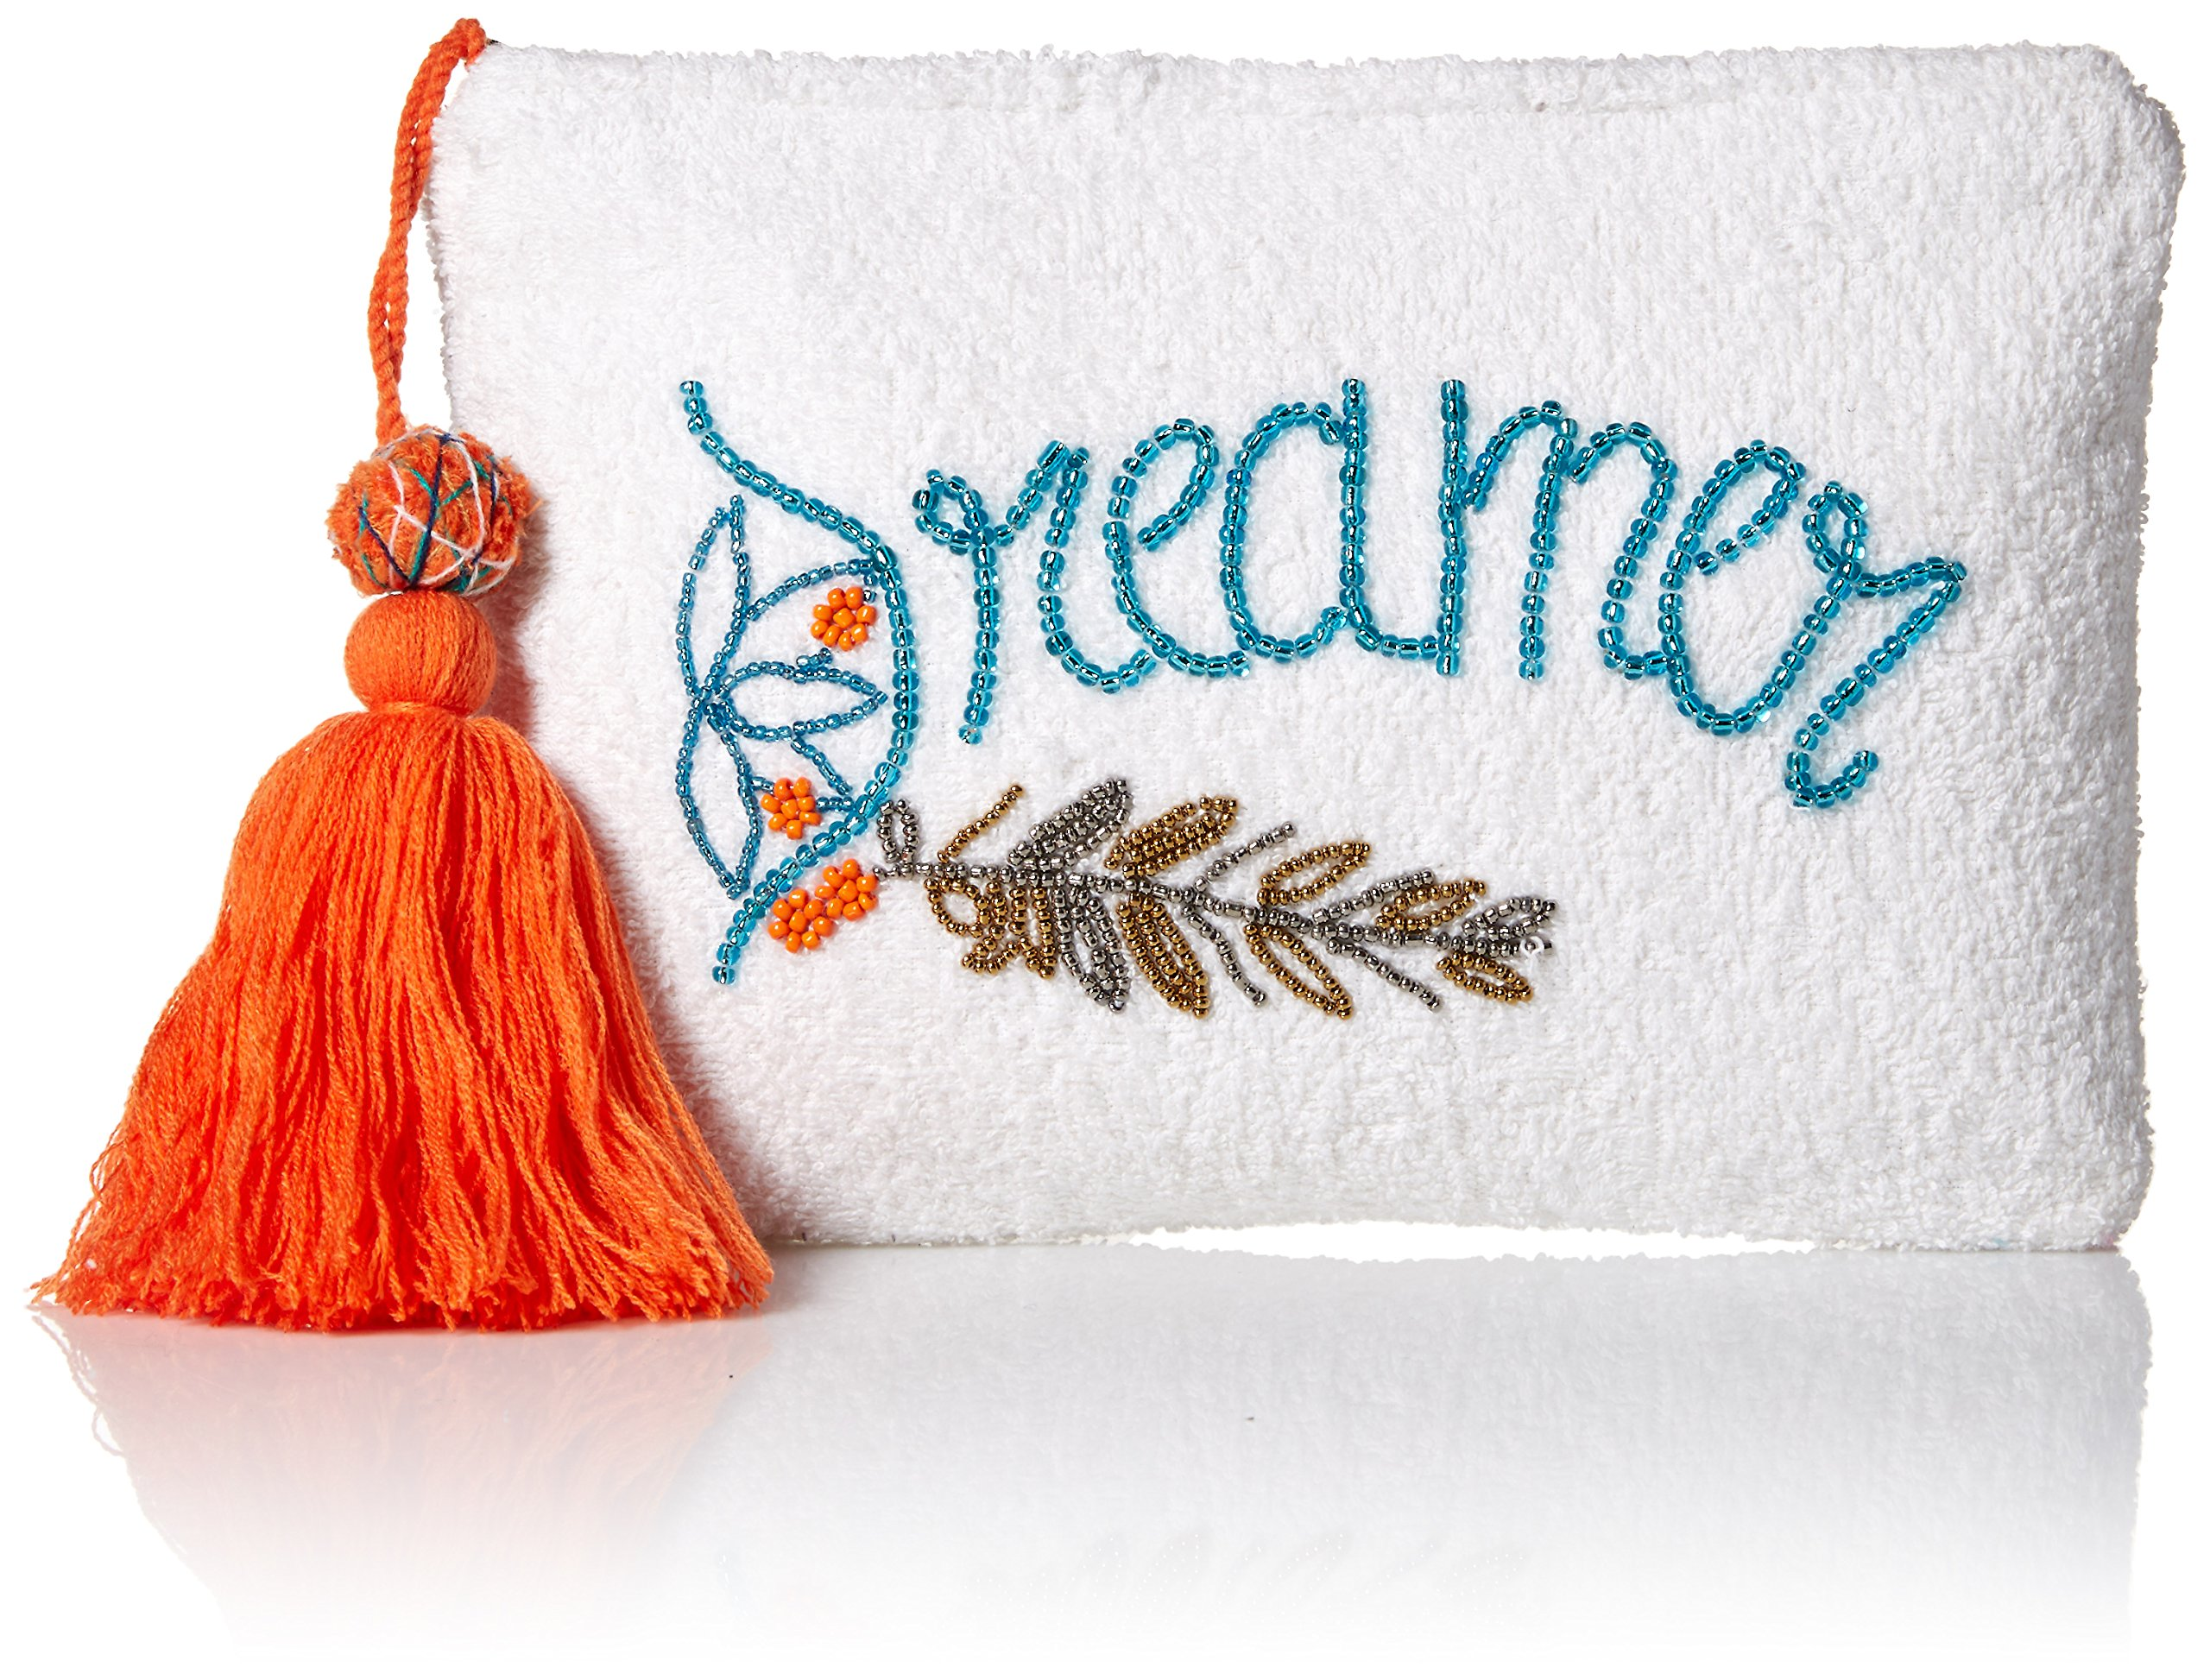 'ale by alessandra Women's Dreamer Plush Cotton Terry Cloth Clutch/Bikini Bag, grey One Size